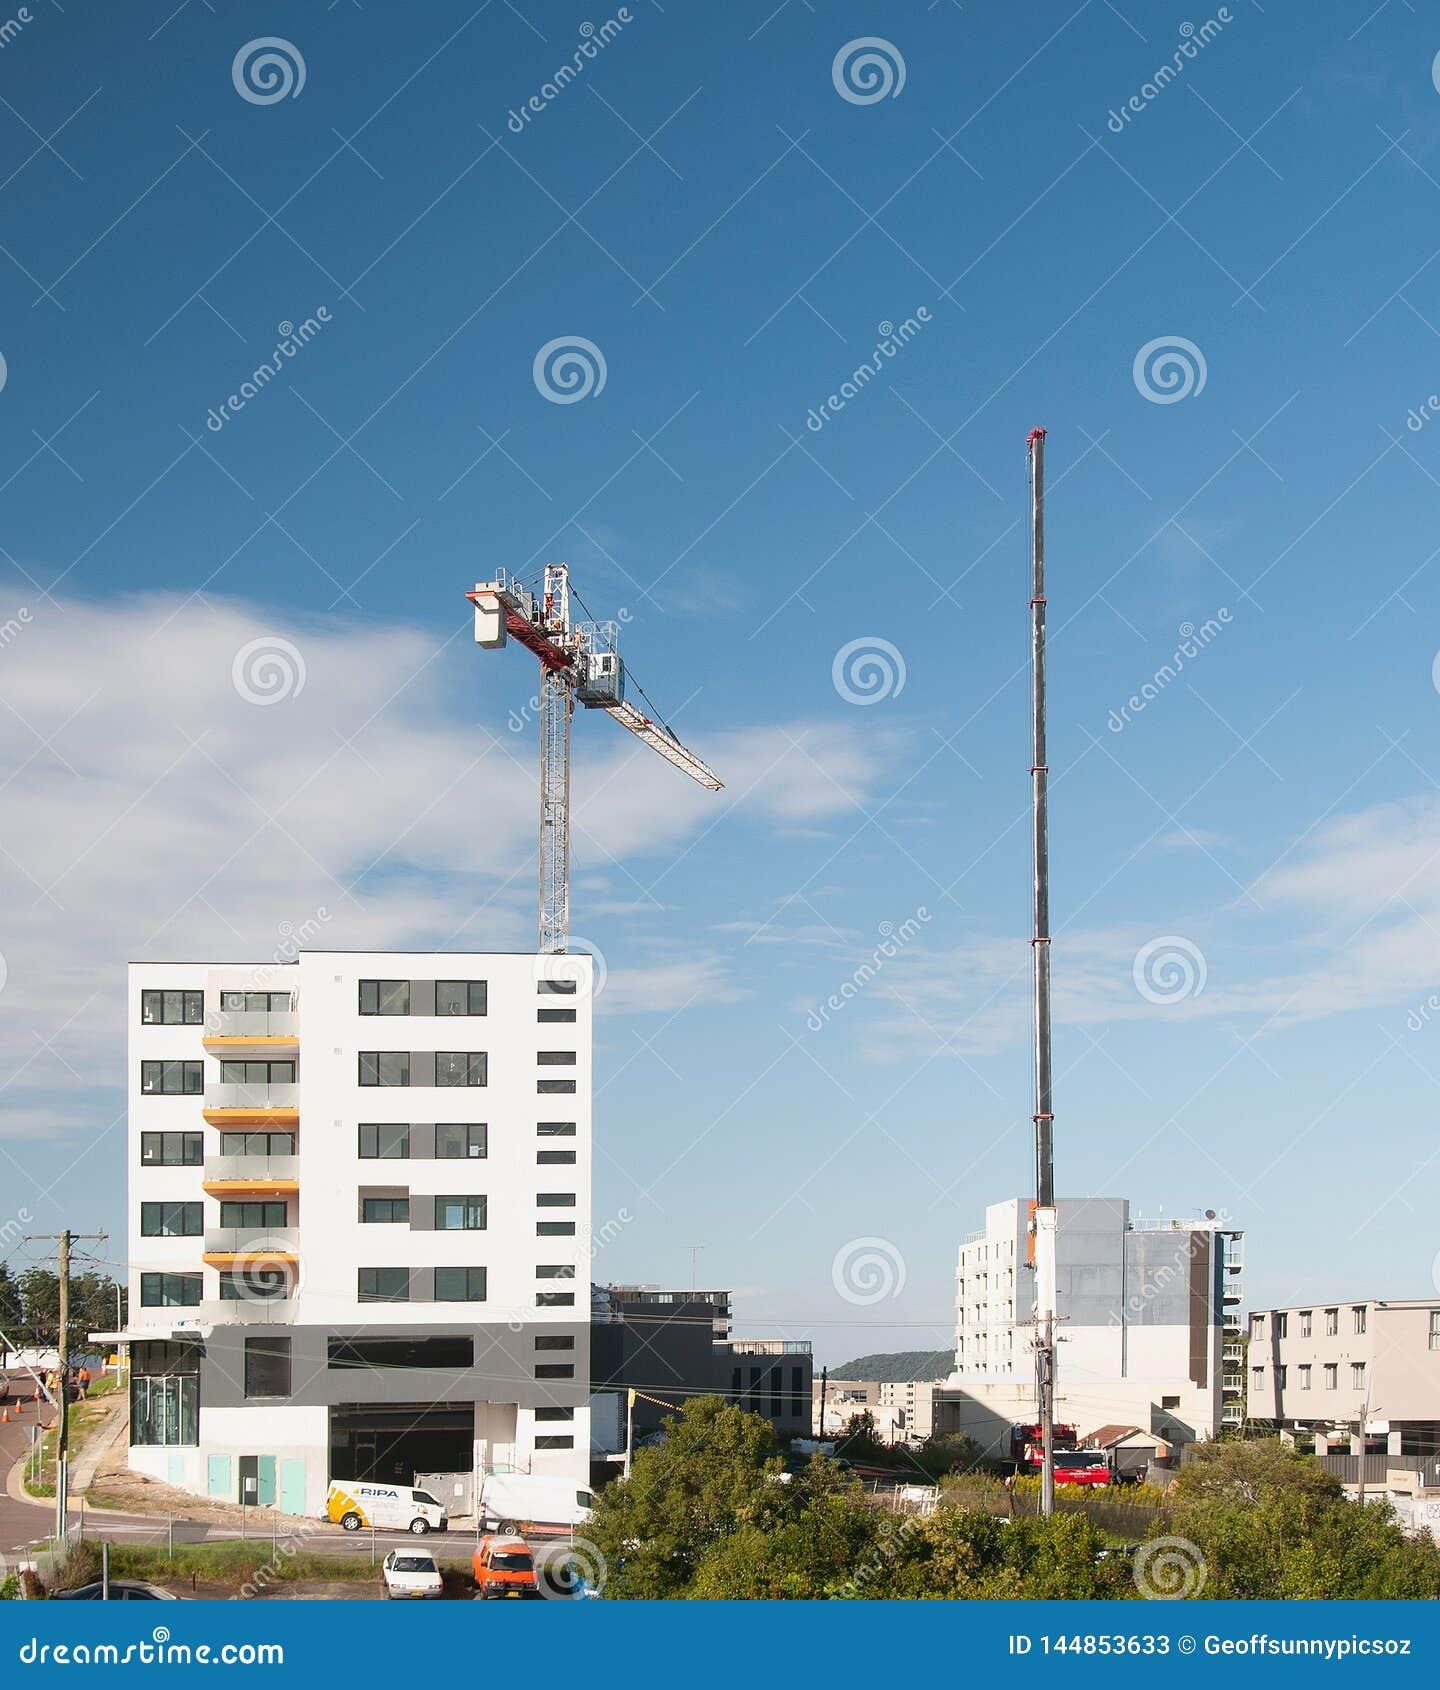 Construction crane removal. Update ed300 . Gosford. April 9, 2019